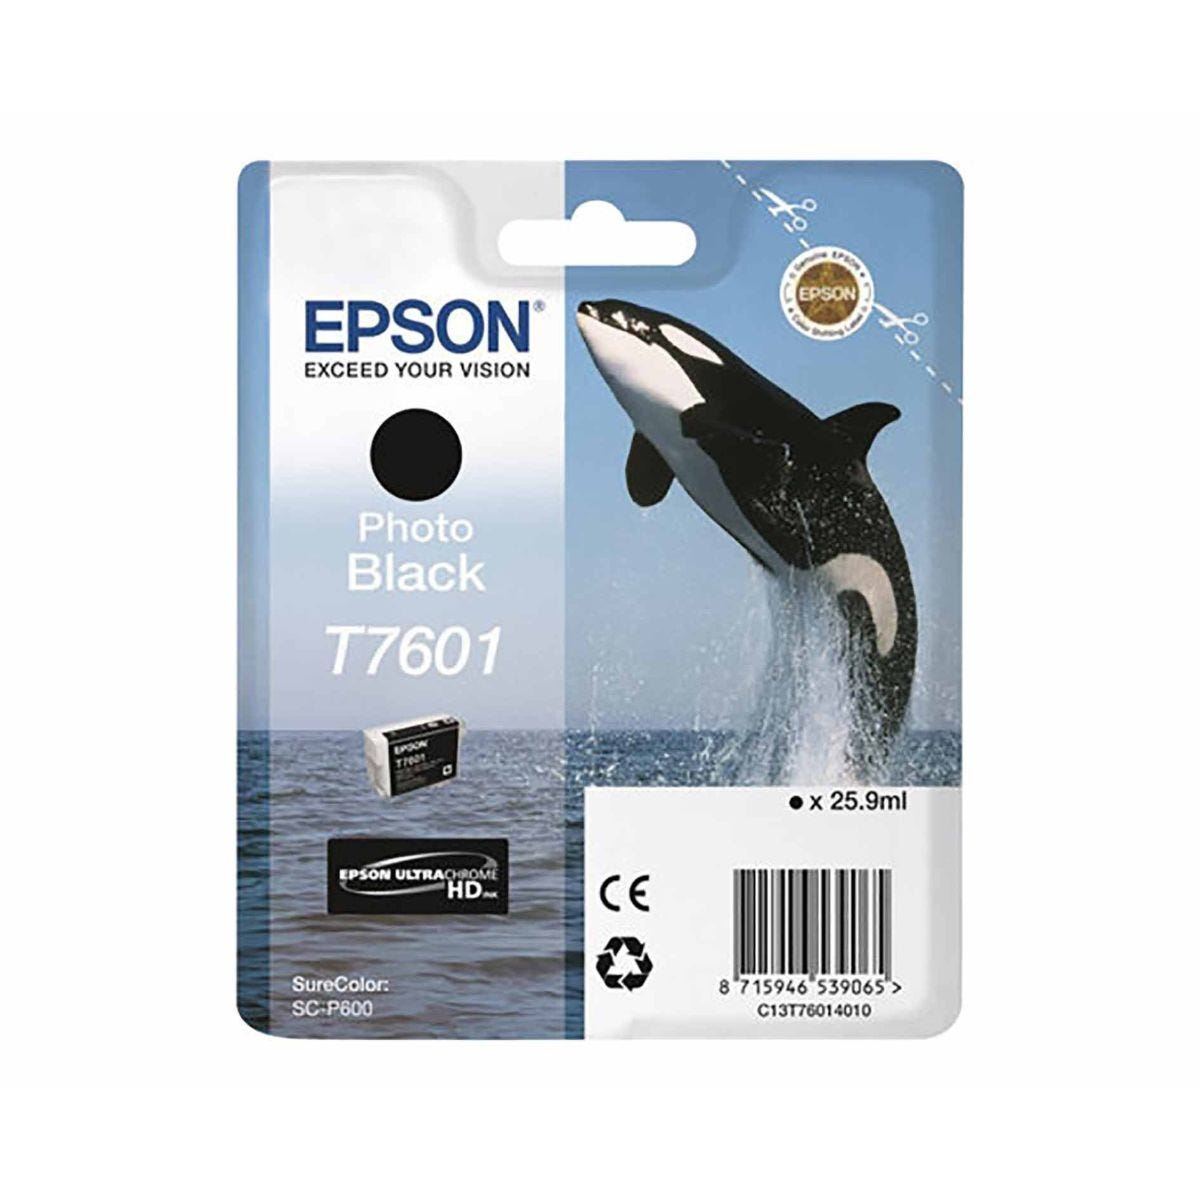 Epson T7601 Photo Ink Cartridge Black